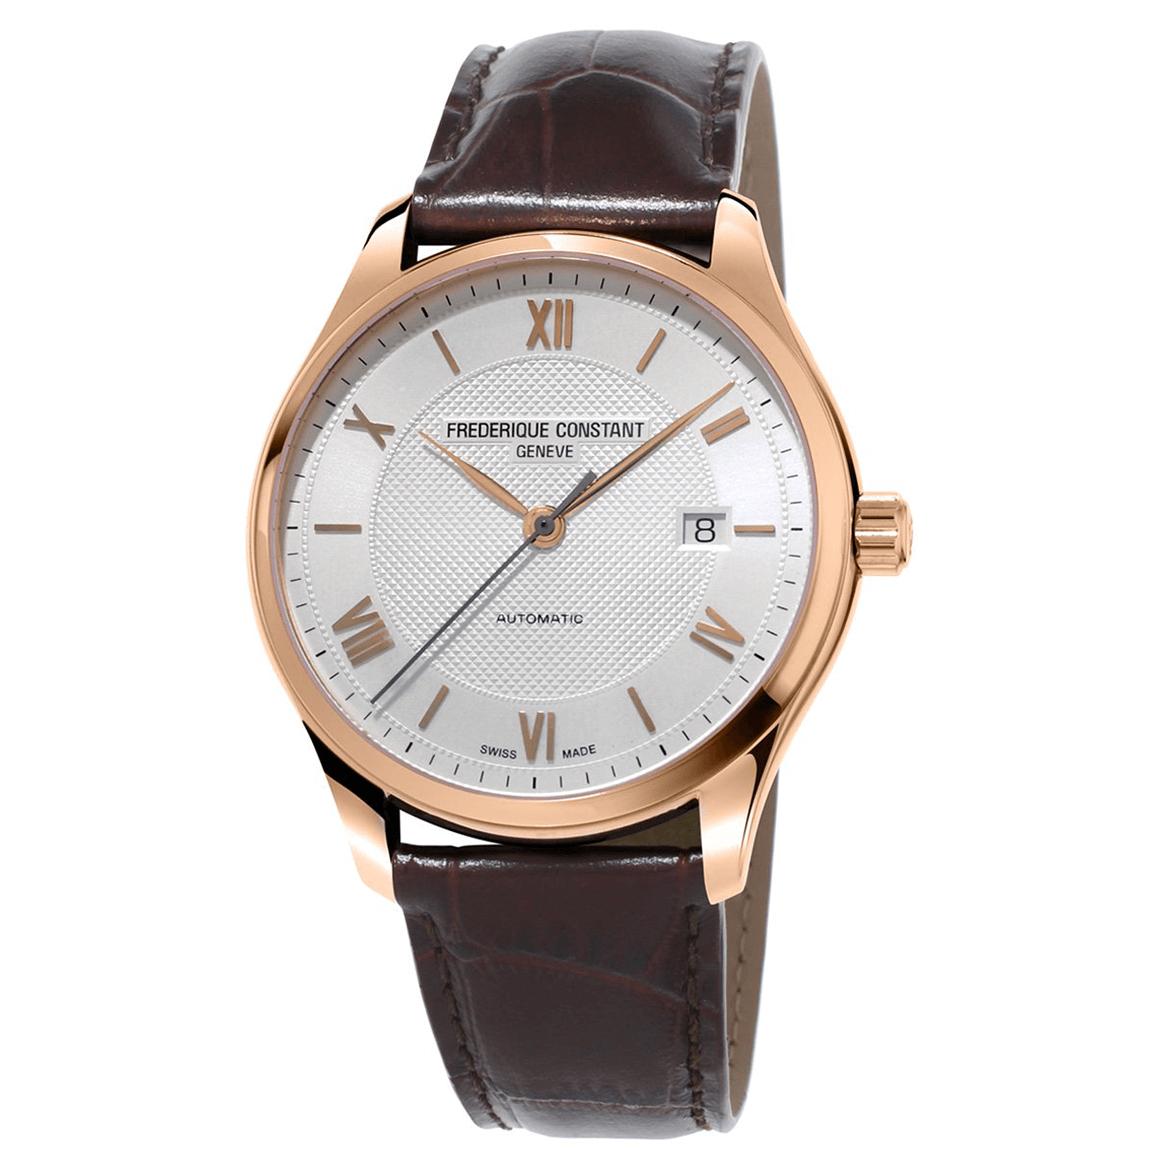 Frederique Constant Classics Index Automatic rose gold men's watch